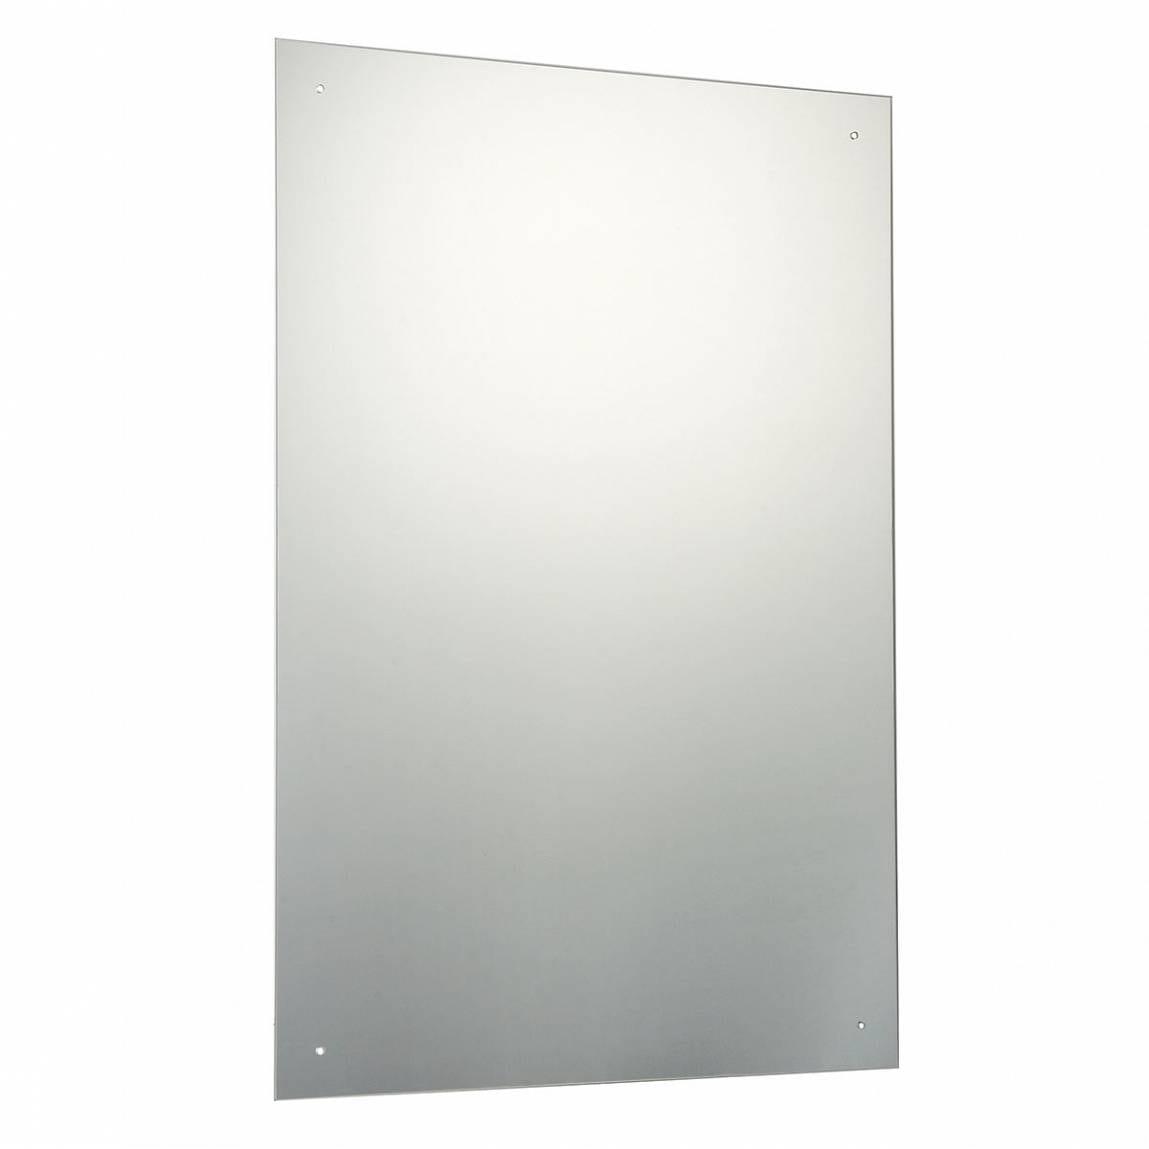 Orchard rectangular bevelled edge drilled mirror 600 x 900